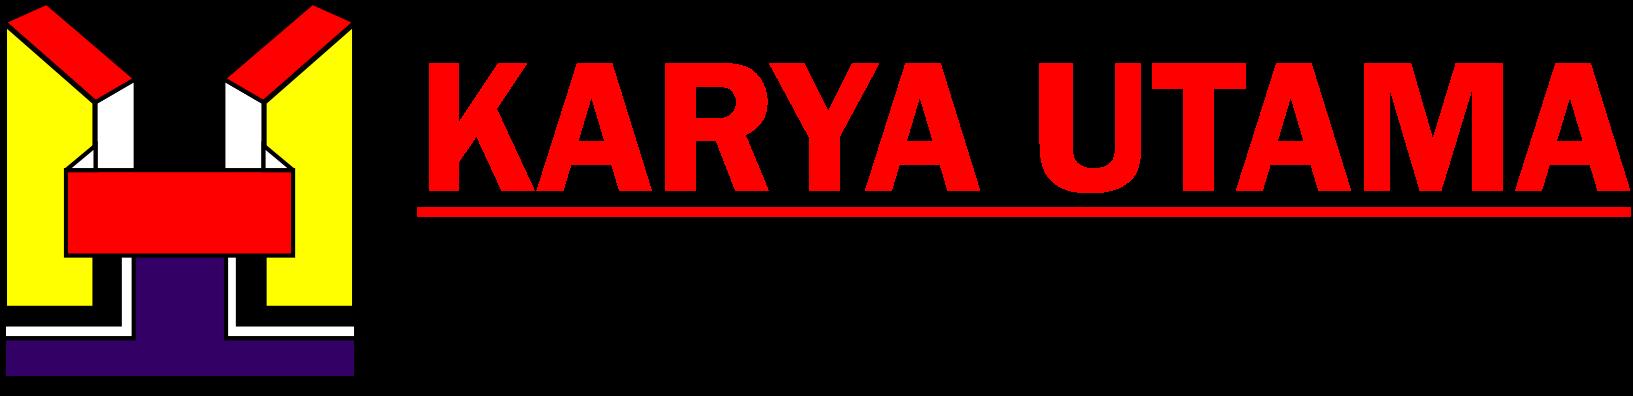 KARYA UTAMA CANGGU